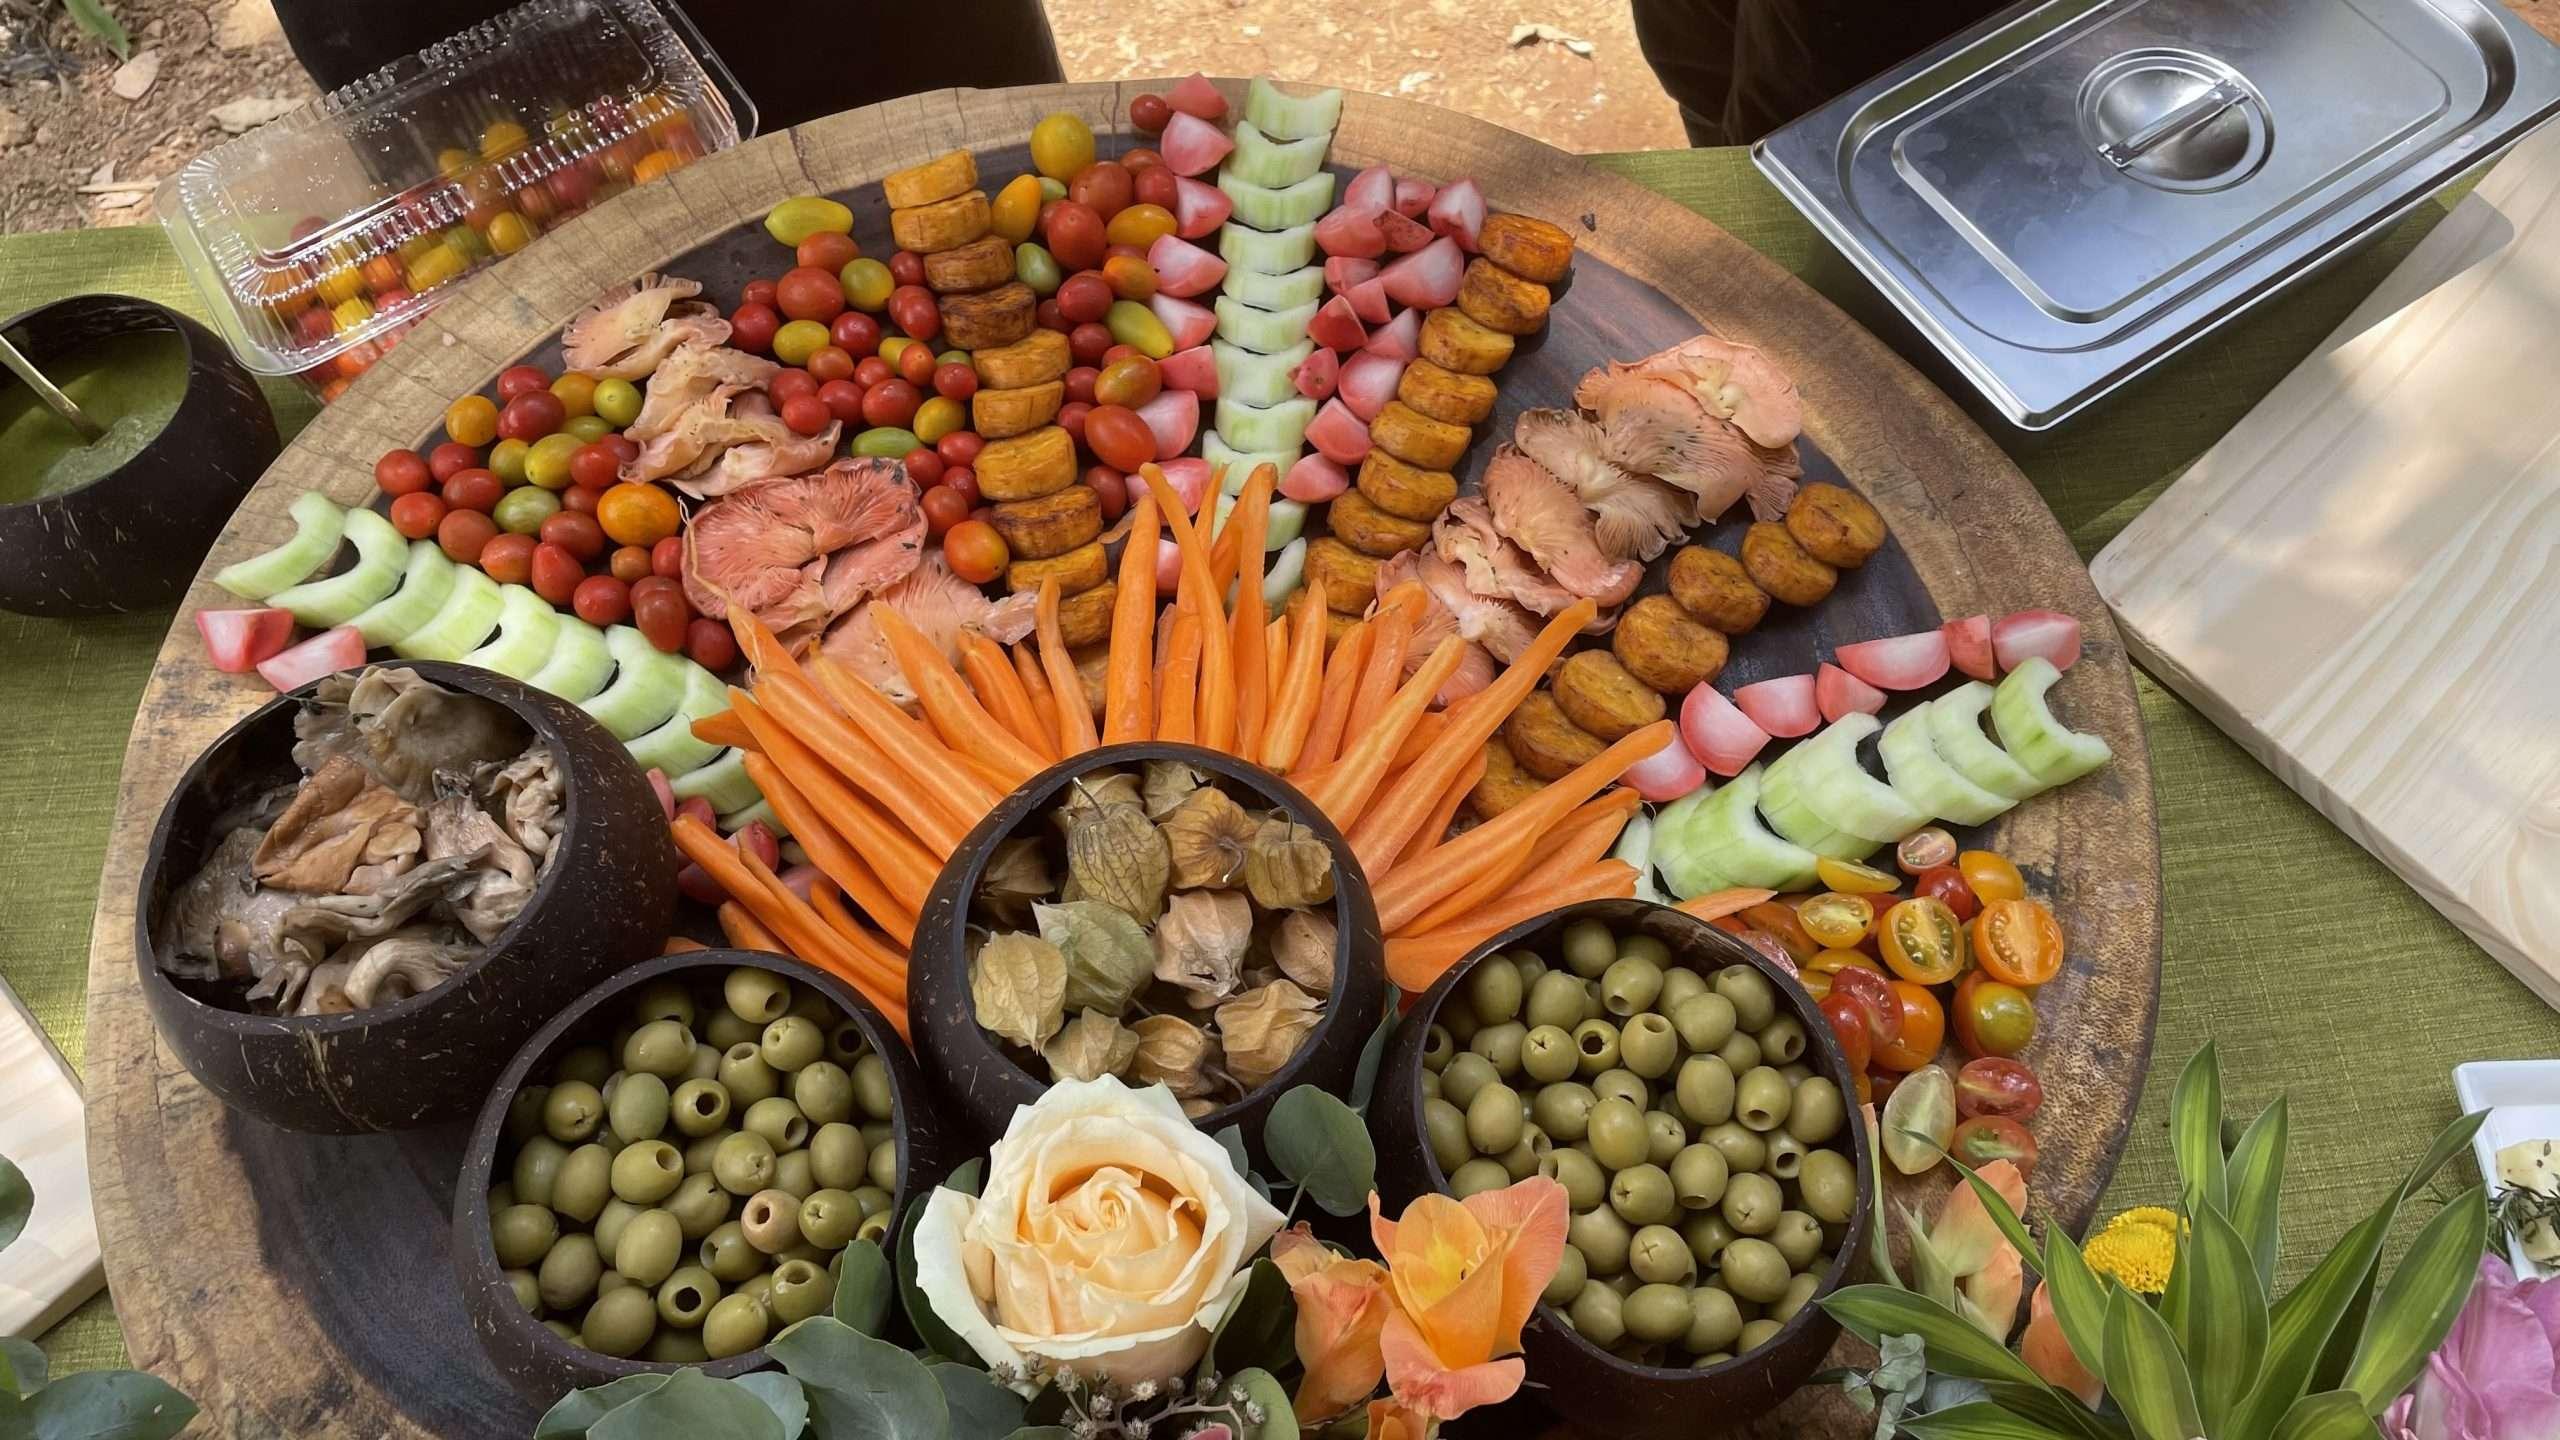 EL Private Chef- Dein ganz besonderer Cateringservice